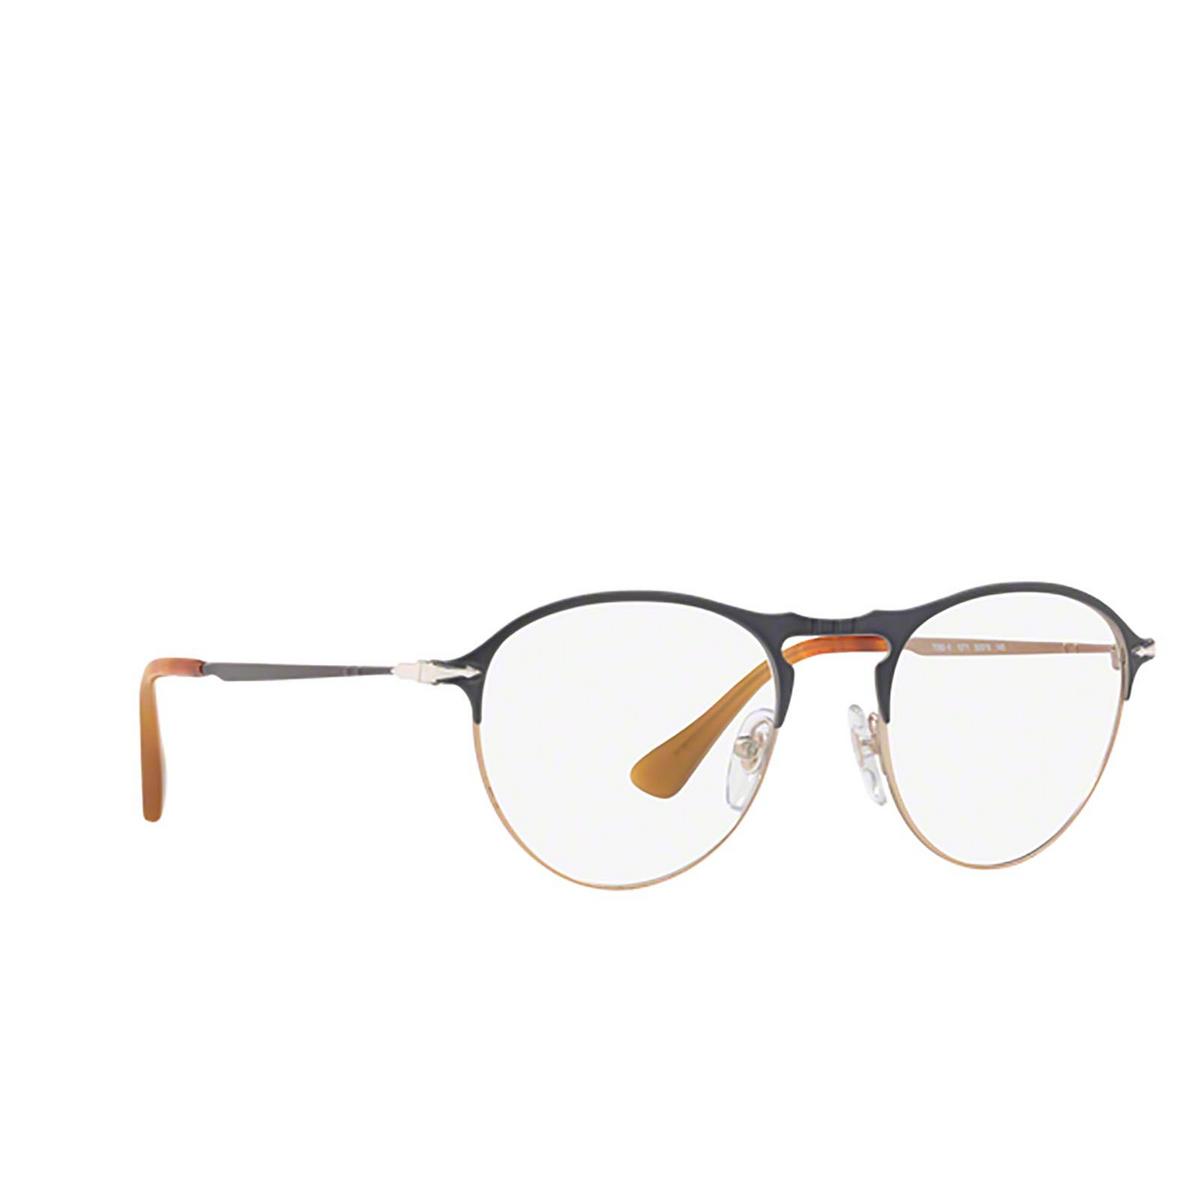 Persol® Round Eyeglasses: PO7092V color Matte Grey / Light Brown 1071 - three-quarters view.